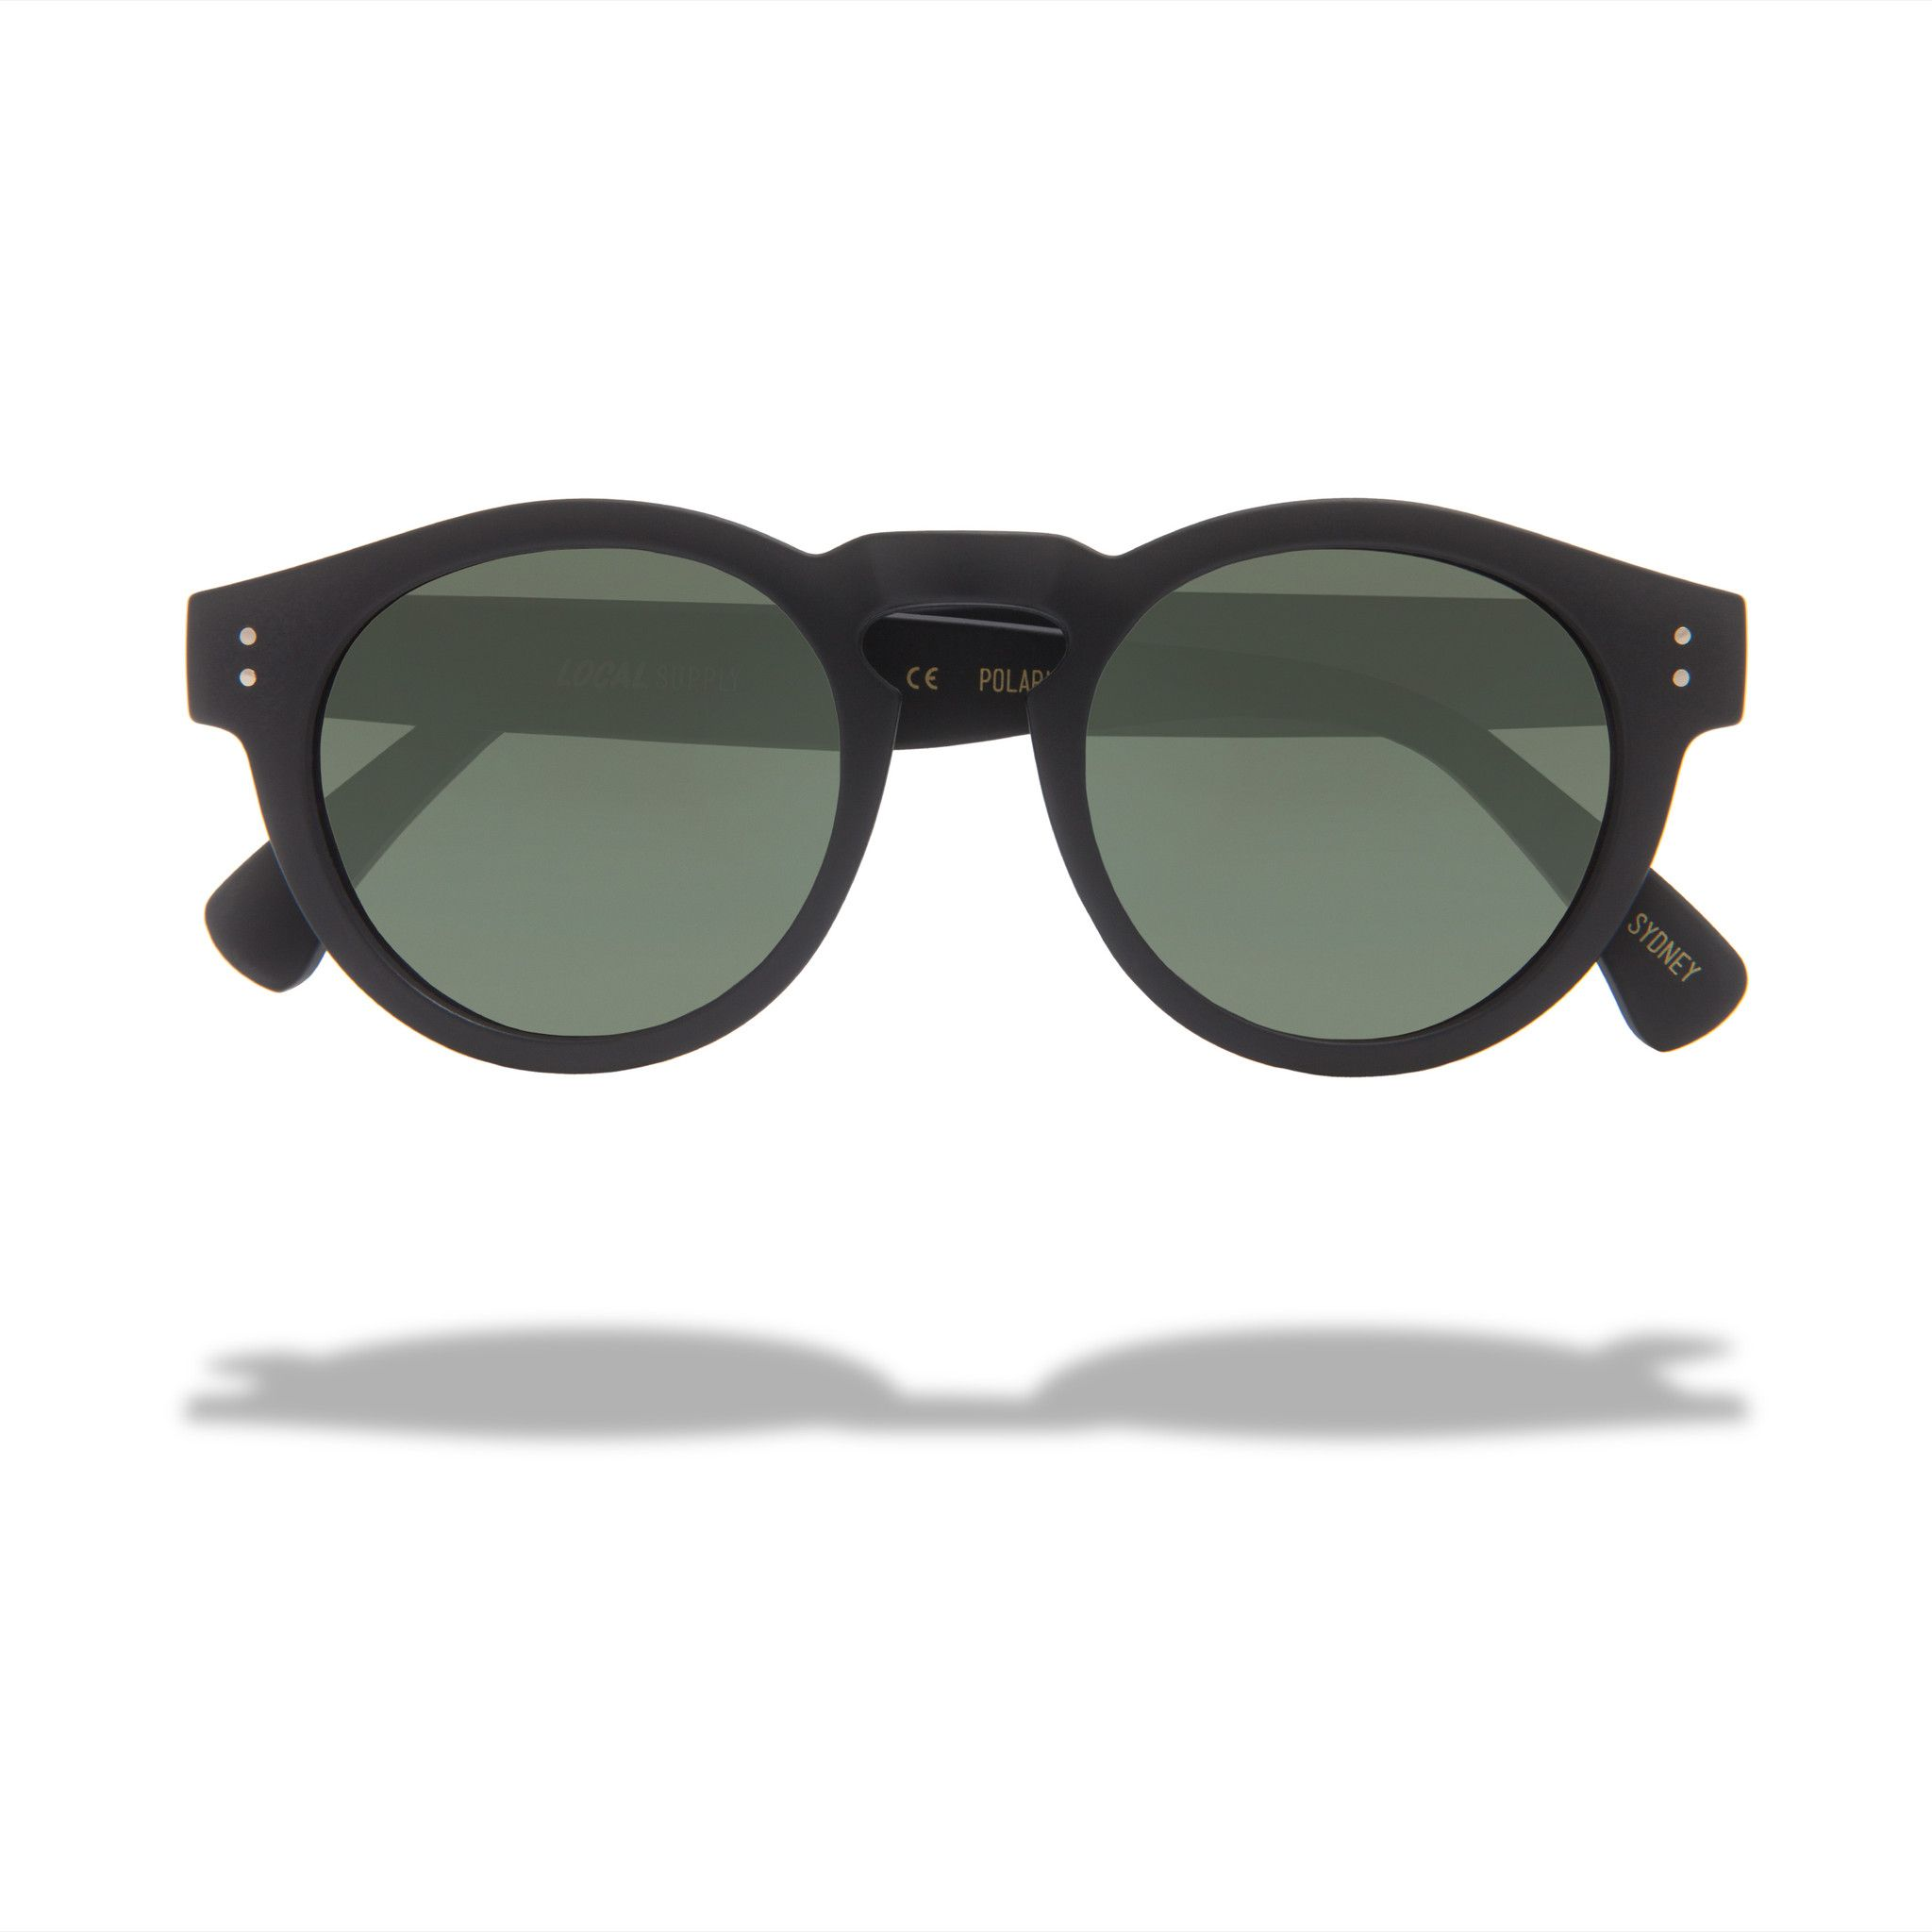 aee19b0151 FREEWAY  DENALI by Australian eyewear designer Local Supply